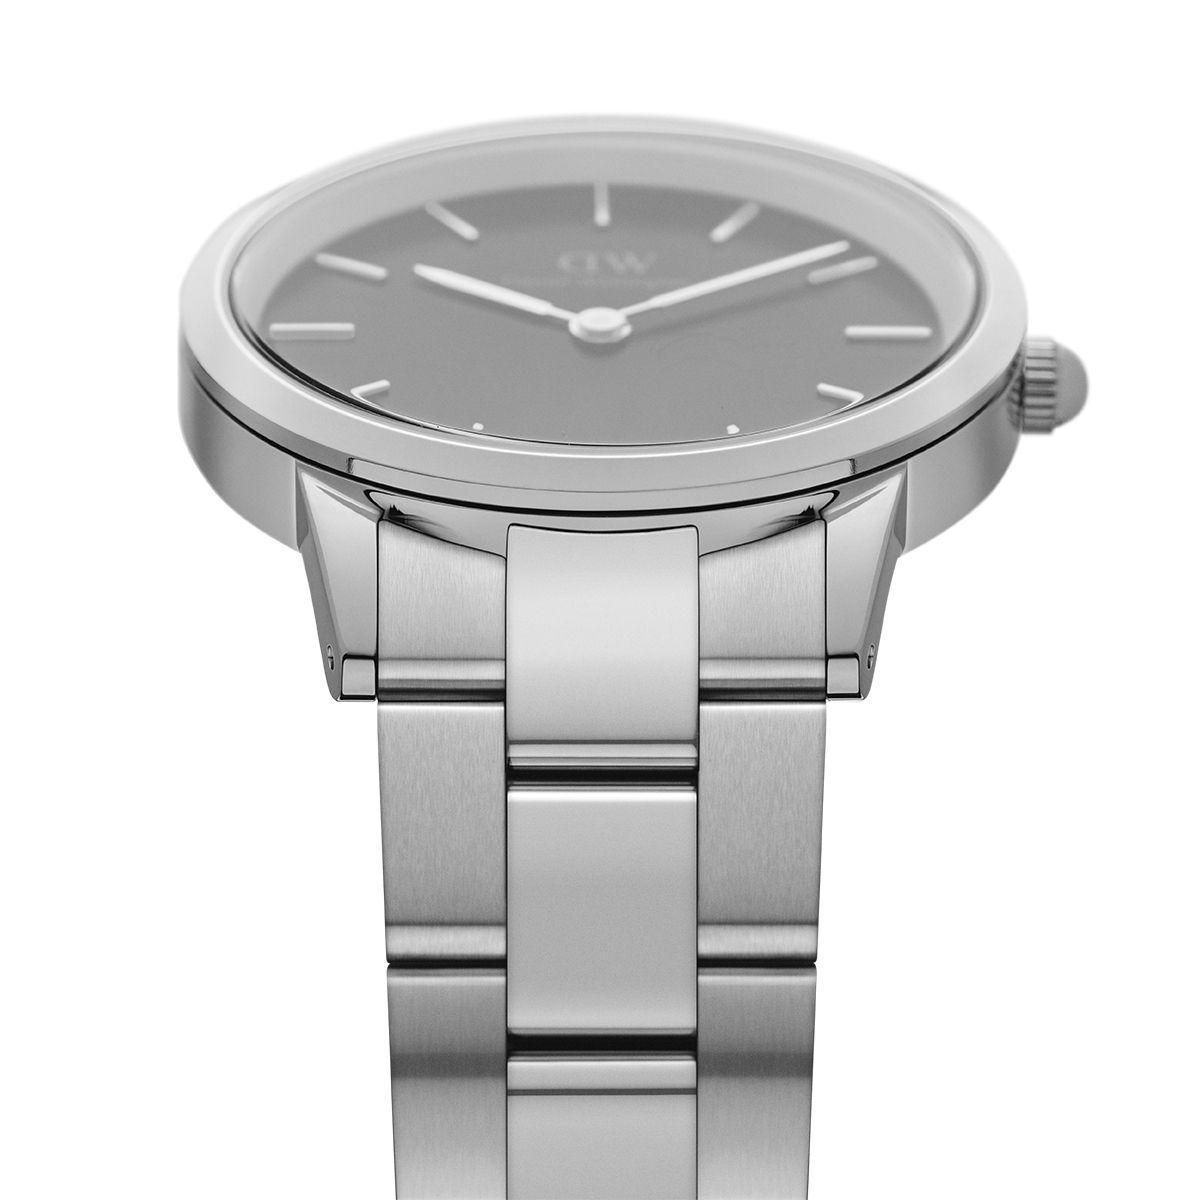 dw官网 dw手表官网 dw中国官网 dw官方旗舰店 DW DW官网  Watch Iconic Black Link Silver 40mm